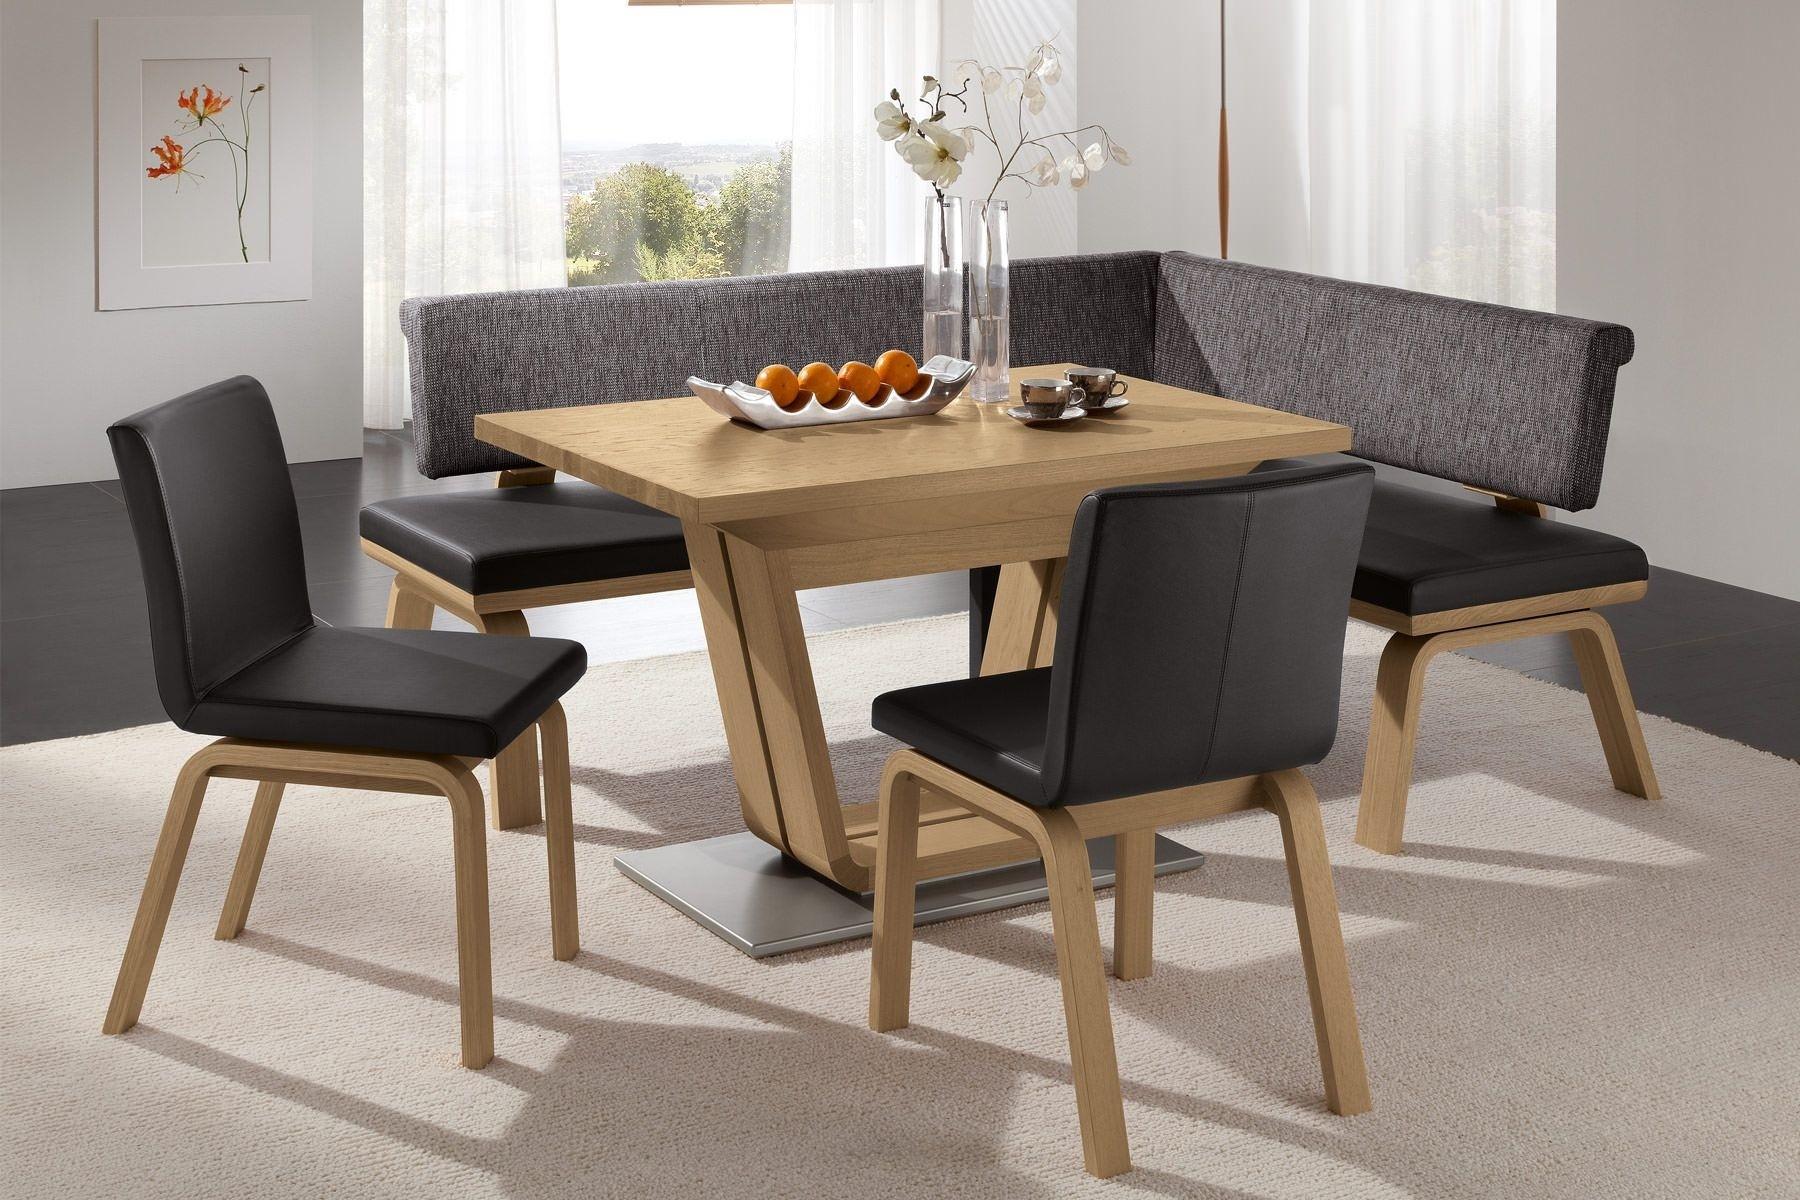 Corner bench dining table set reviews furniture dining room & Corner Bench Dining Table Set - Foter